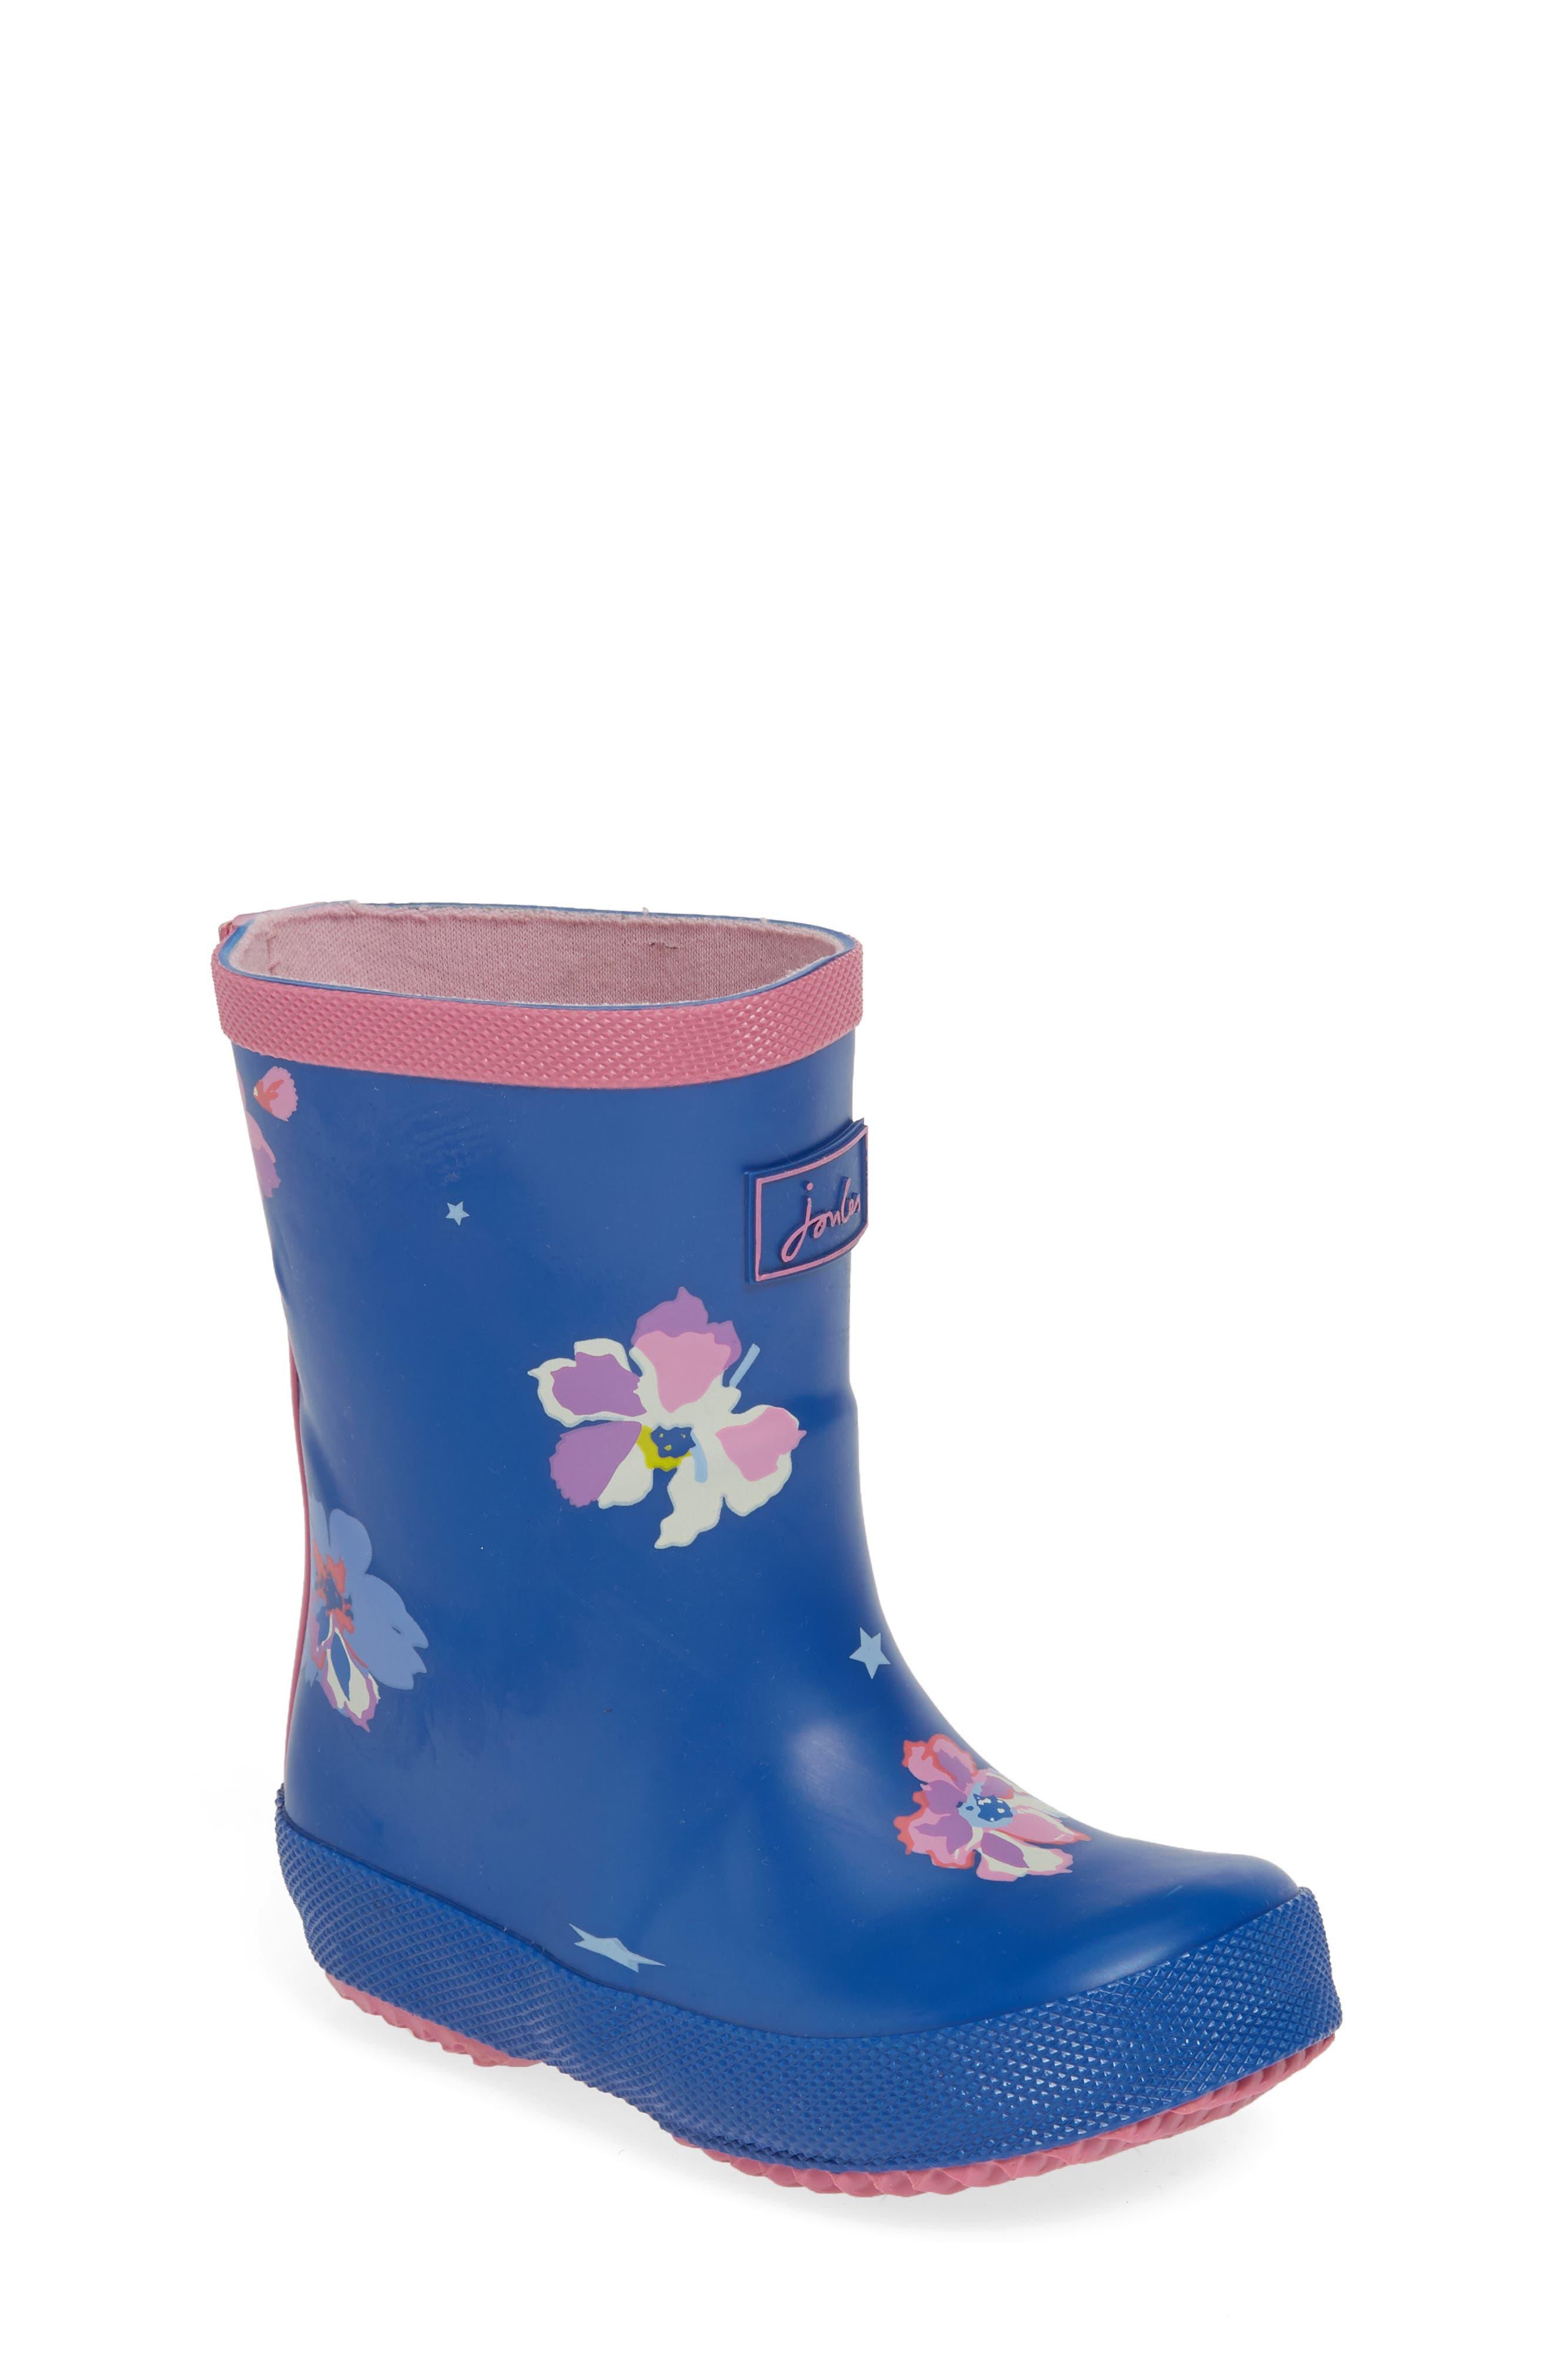 JOULES, Print Waterproof Rain Boot, Main thumbnail 1, color, BLUE CONFETTI FLORAL